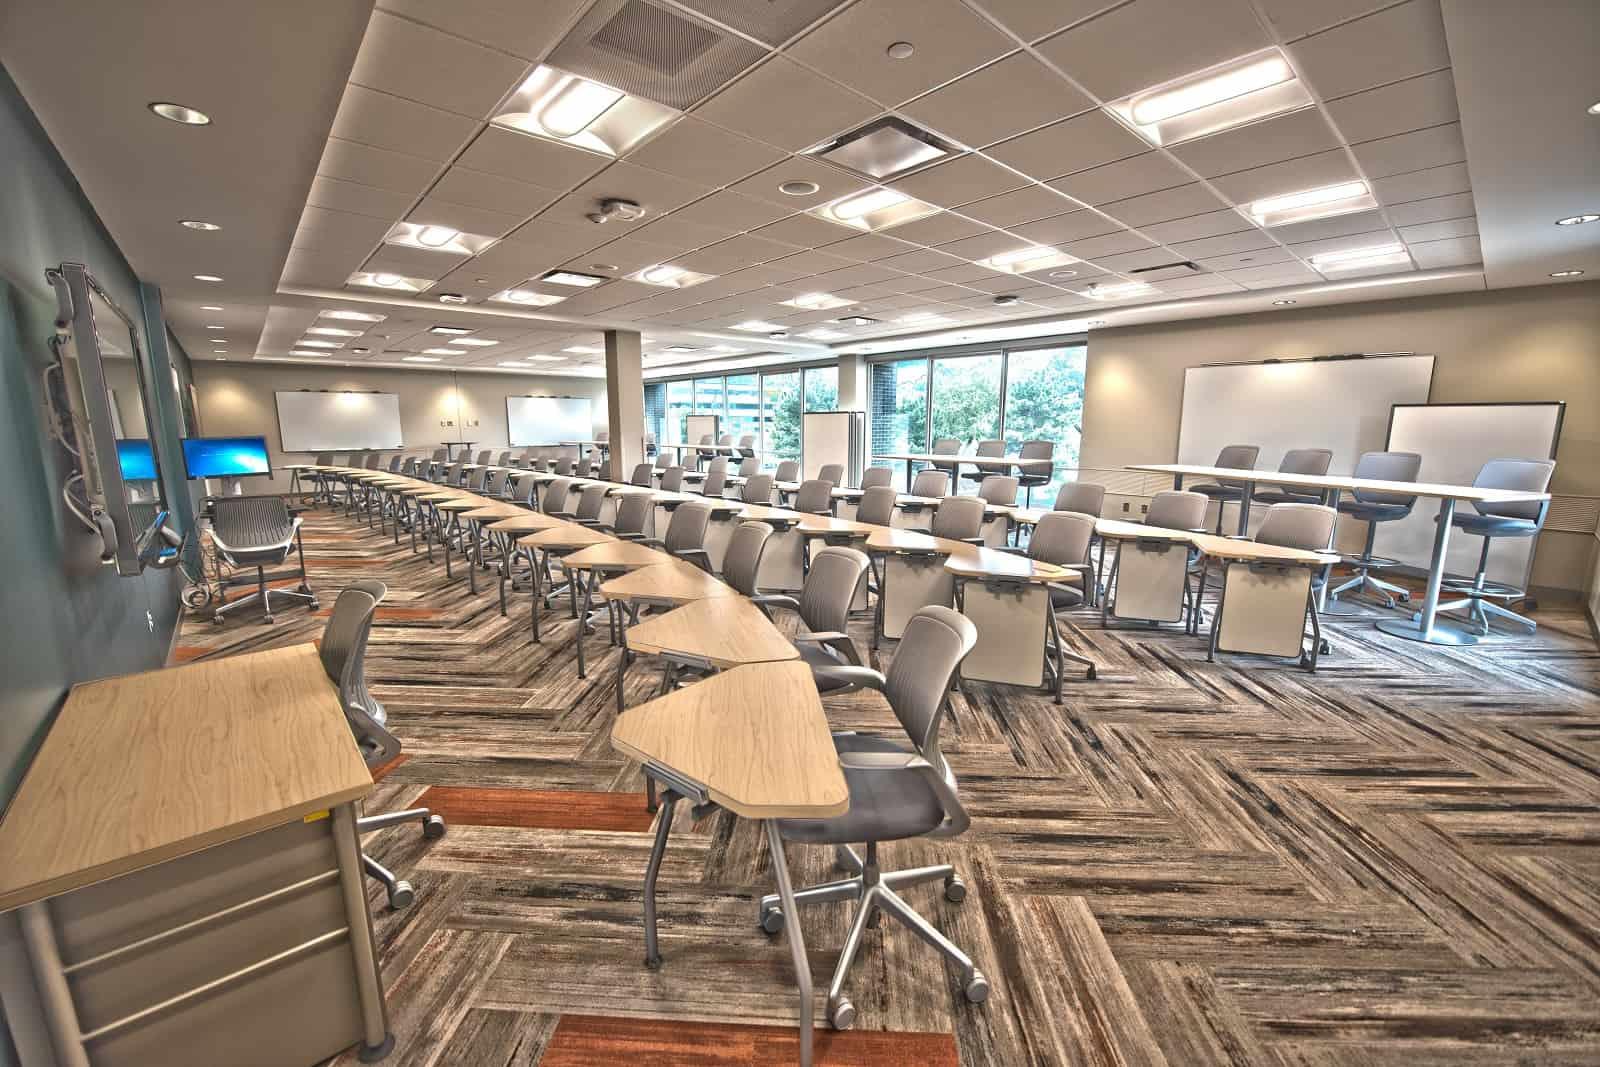 dcf valuation method classroom